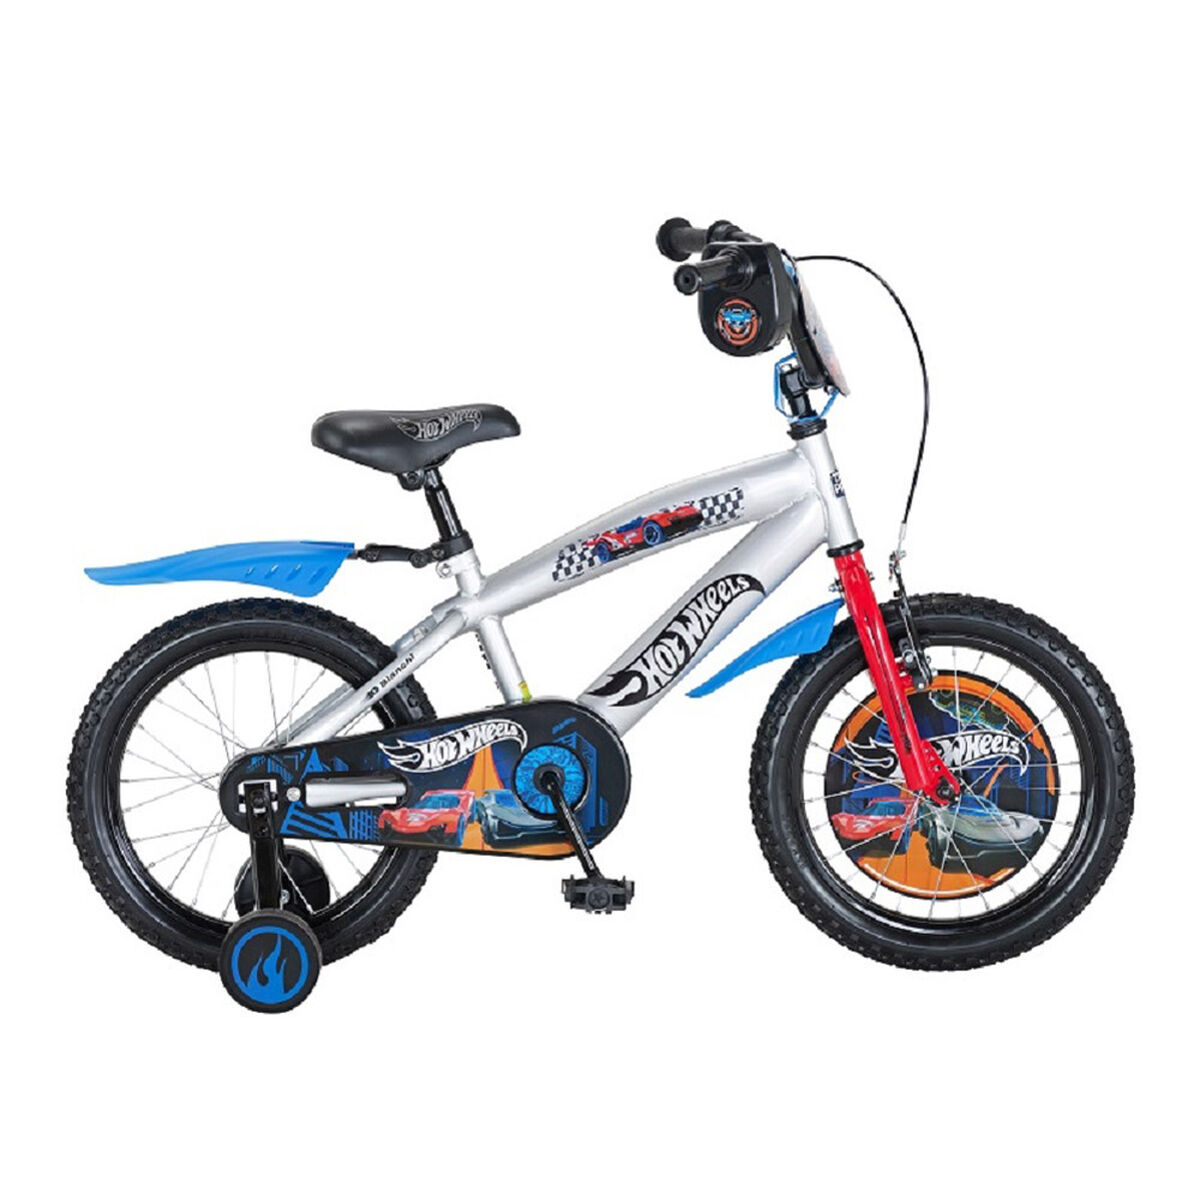 Bicicleta Hotwheels Niño 16